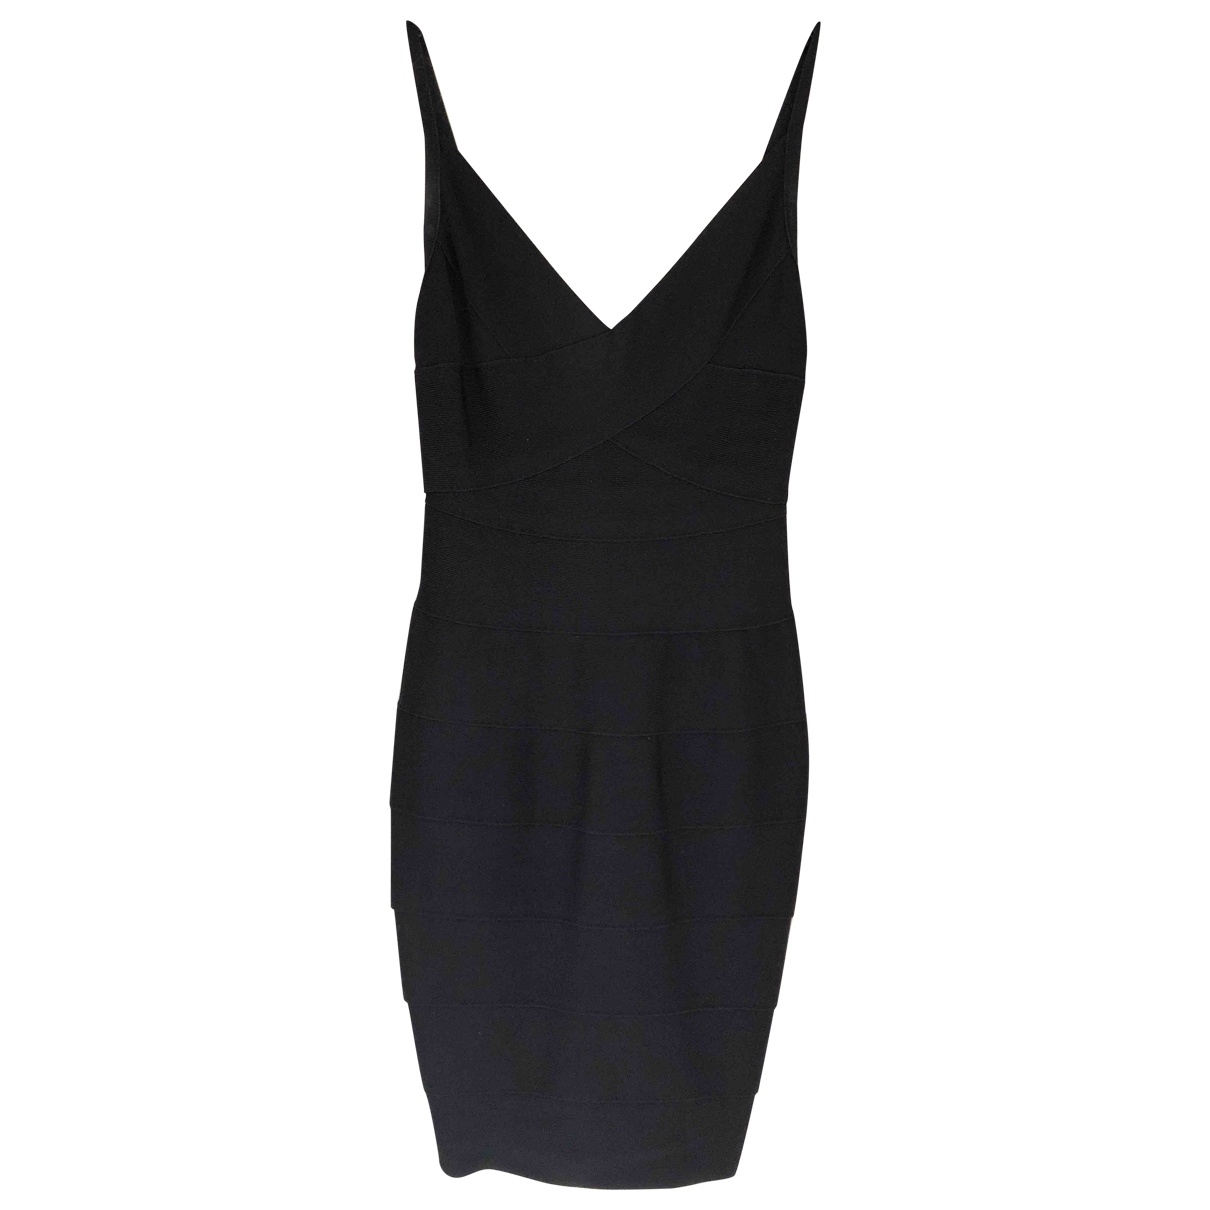 Herve Leger \N Black dress for Women 36 IT